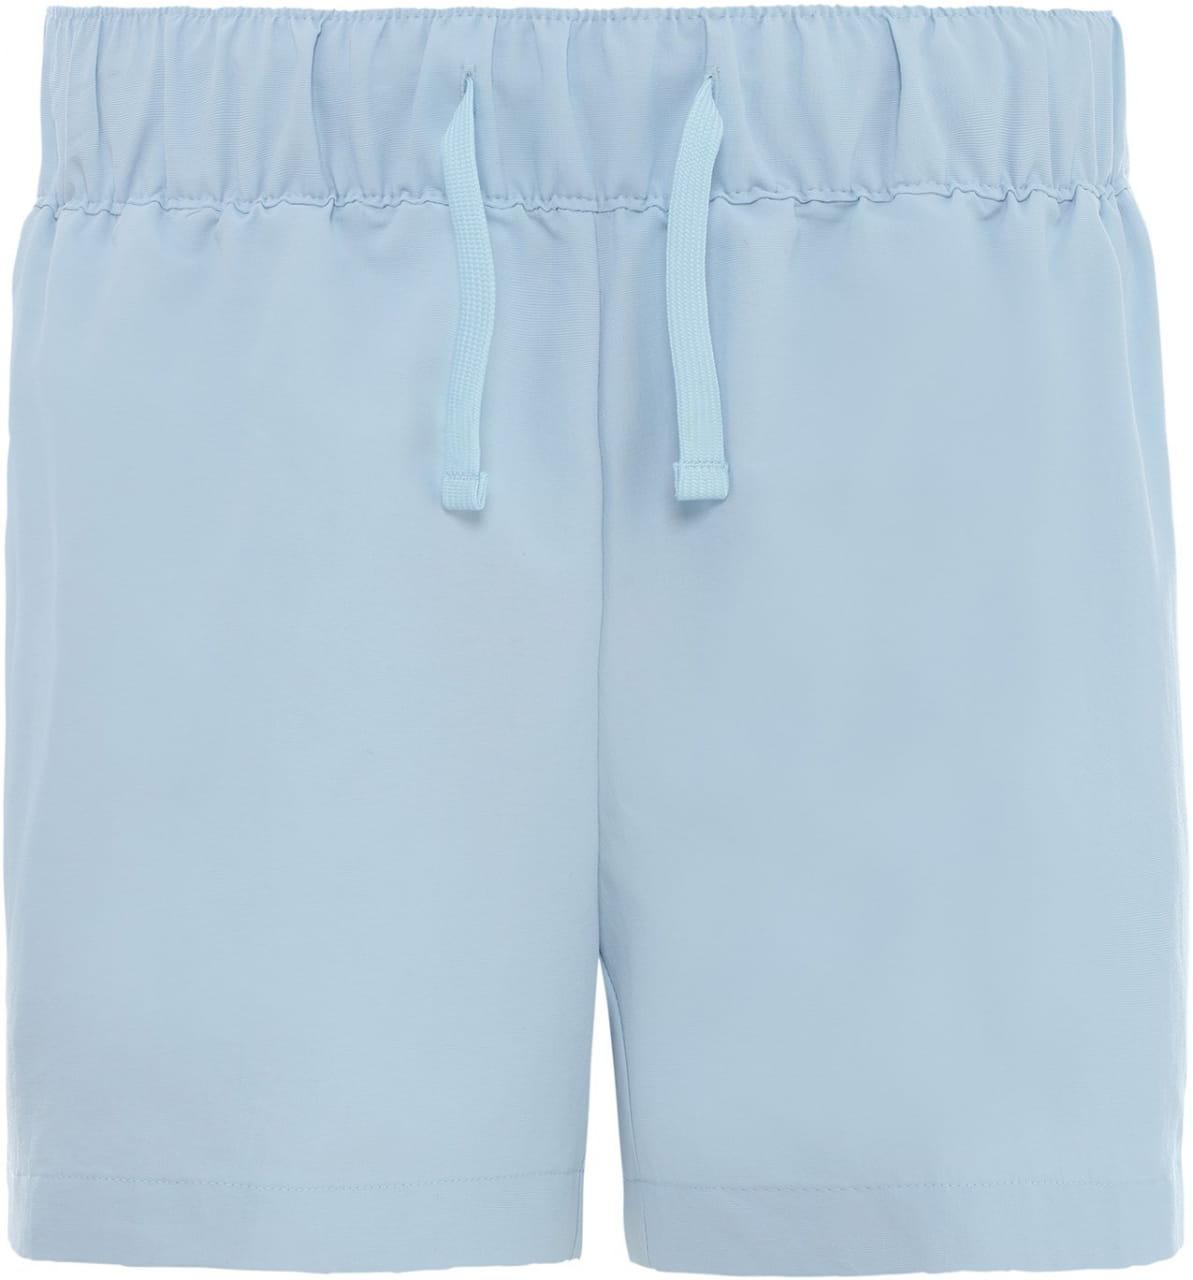 Dámské kraťasy The North Face Women's Class V Shorts